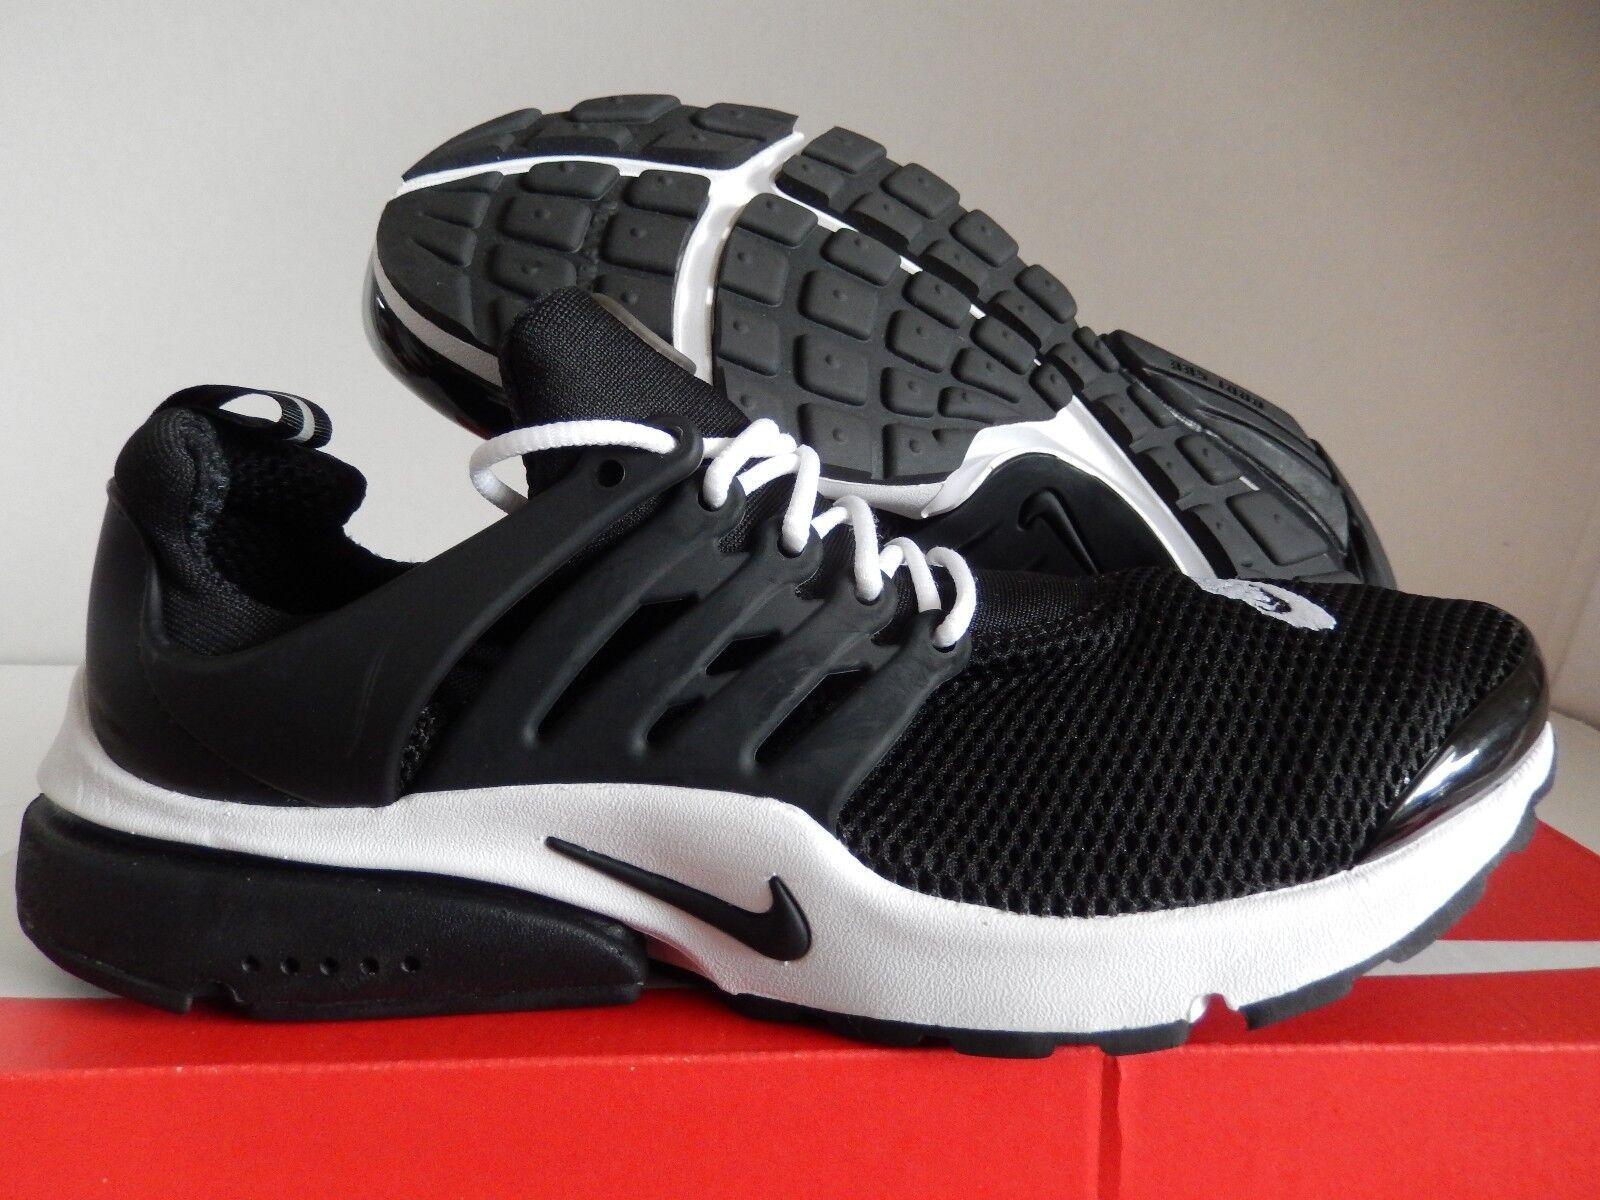 Hombre Nike Air Presto Negroblanco ID Negroblanco Presto [846438991] b2dba8